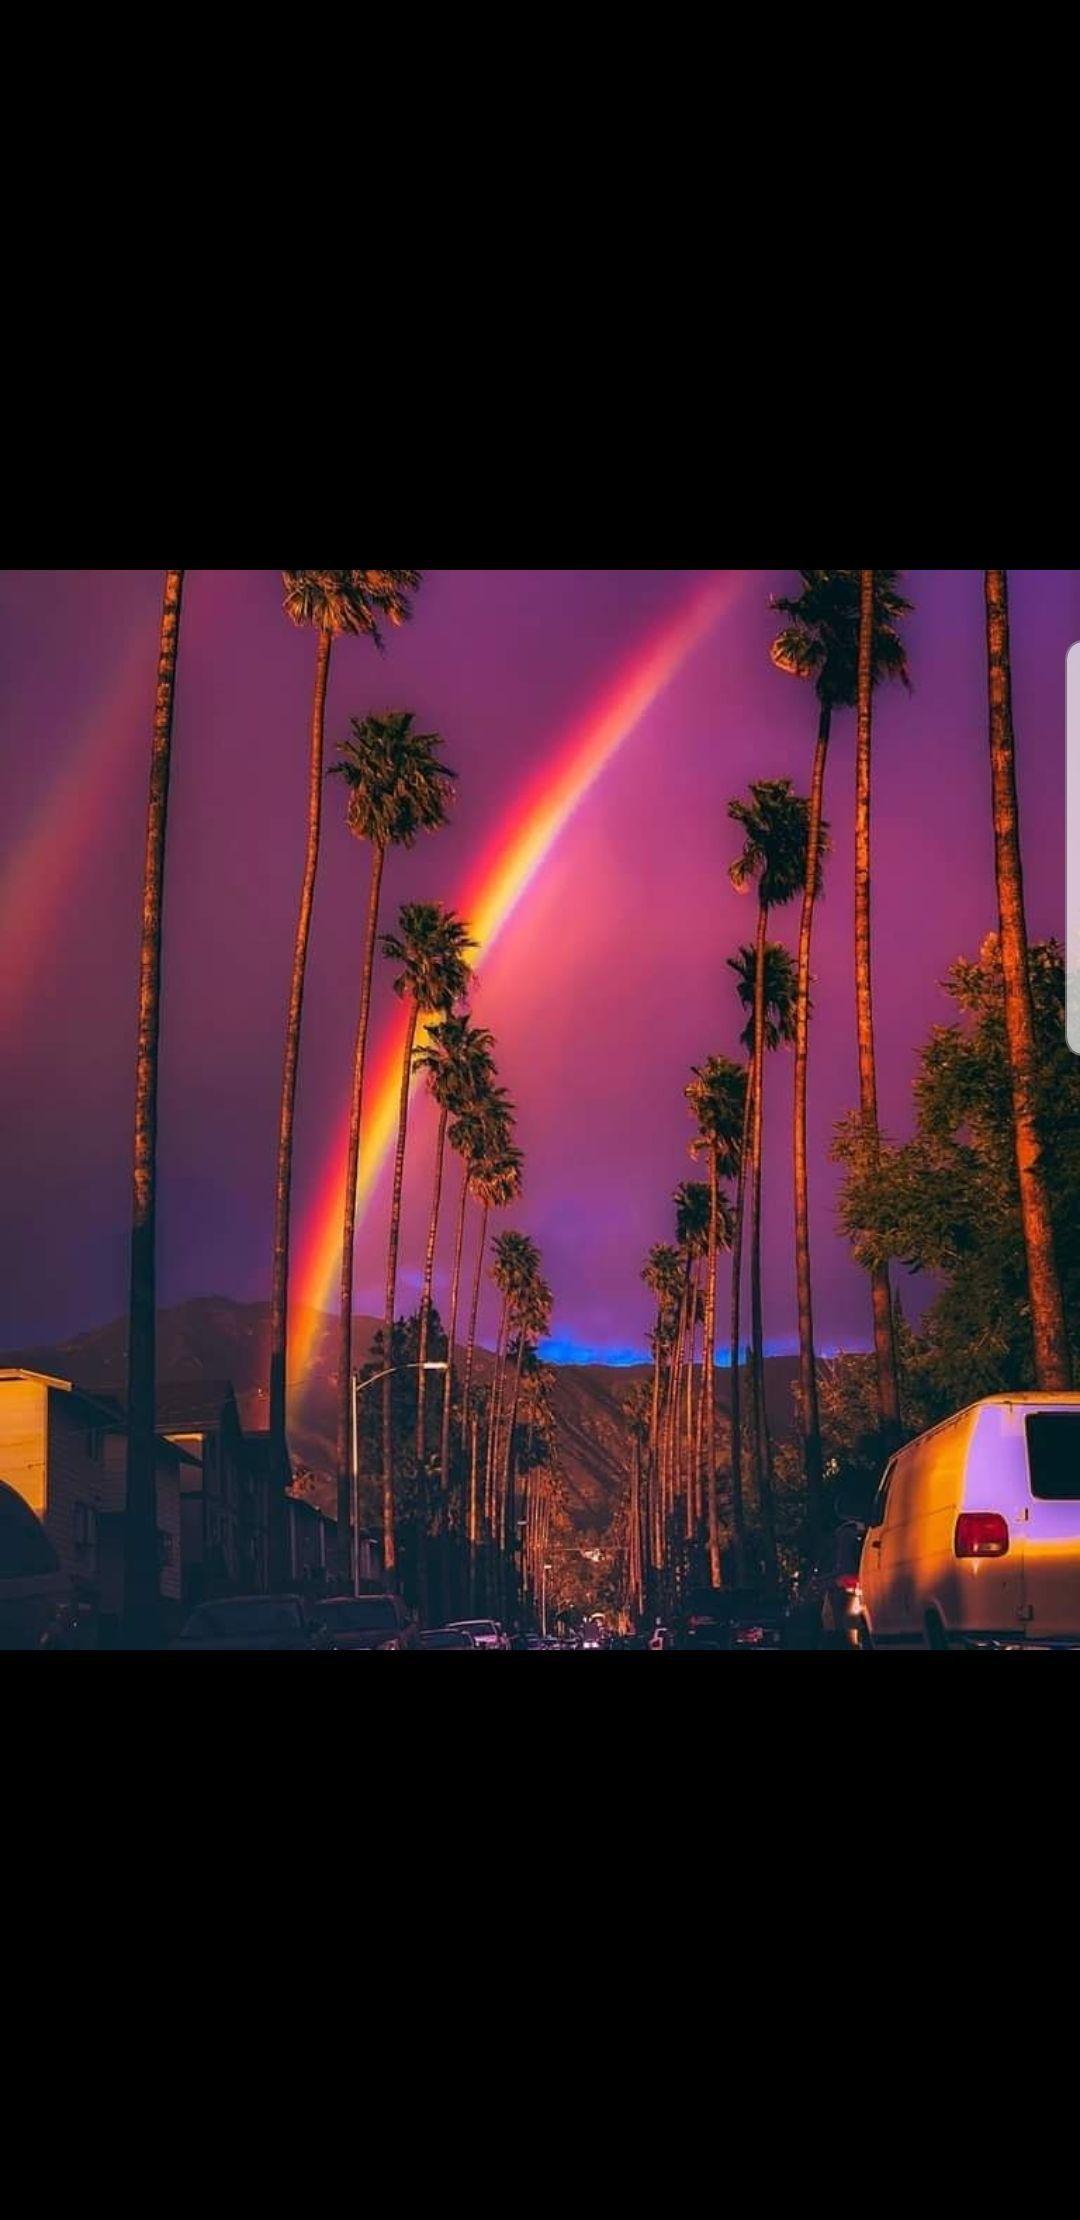 #CaliforniaDreamin-ad_1]  #CaliforniaDreamin  #california #cali #life #puravida #happy #arcoiris   -#Eyelashcateye #Eyelashextensions #Eyelashindividual #Eyelashsims4 #Eyelashwallpaper